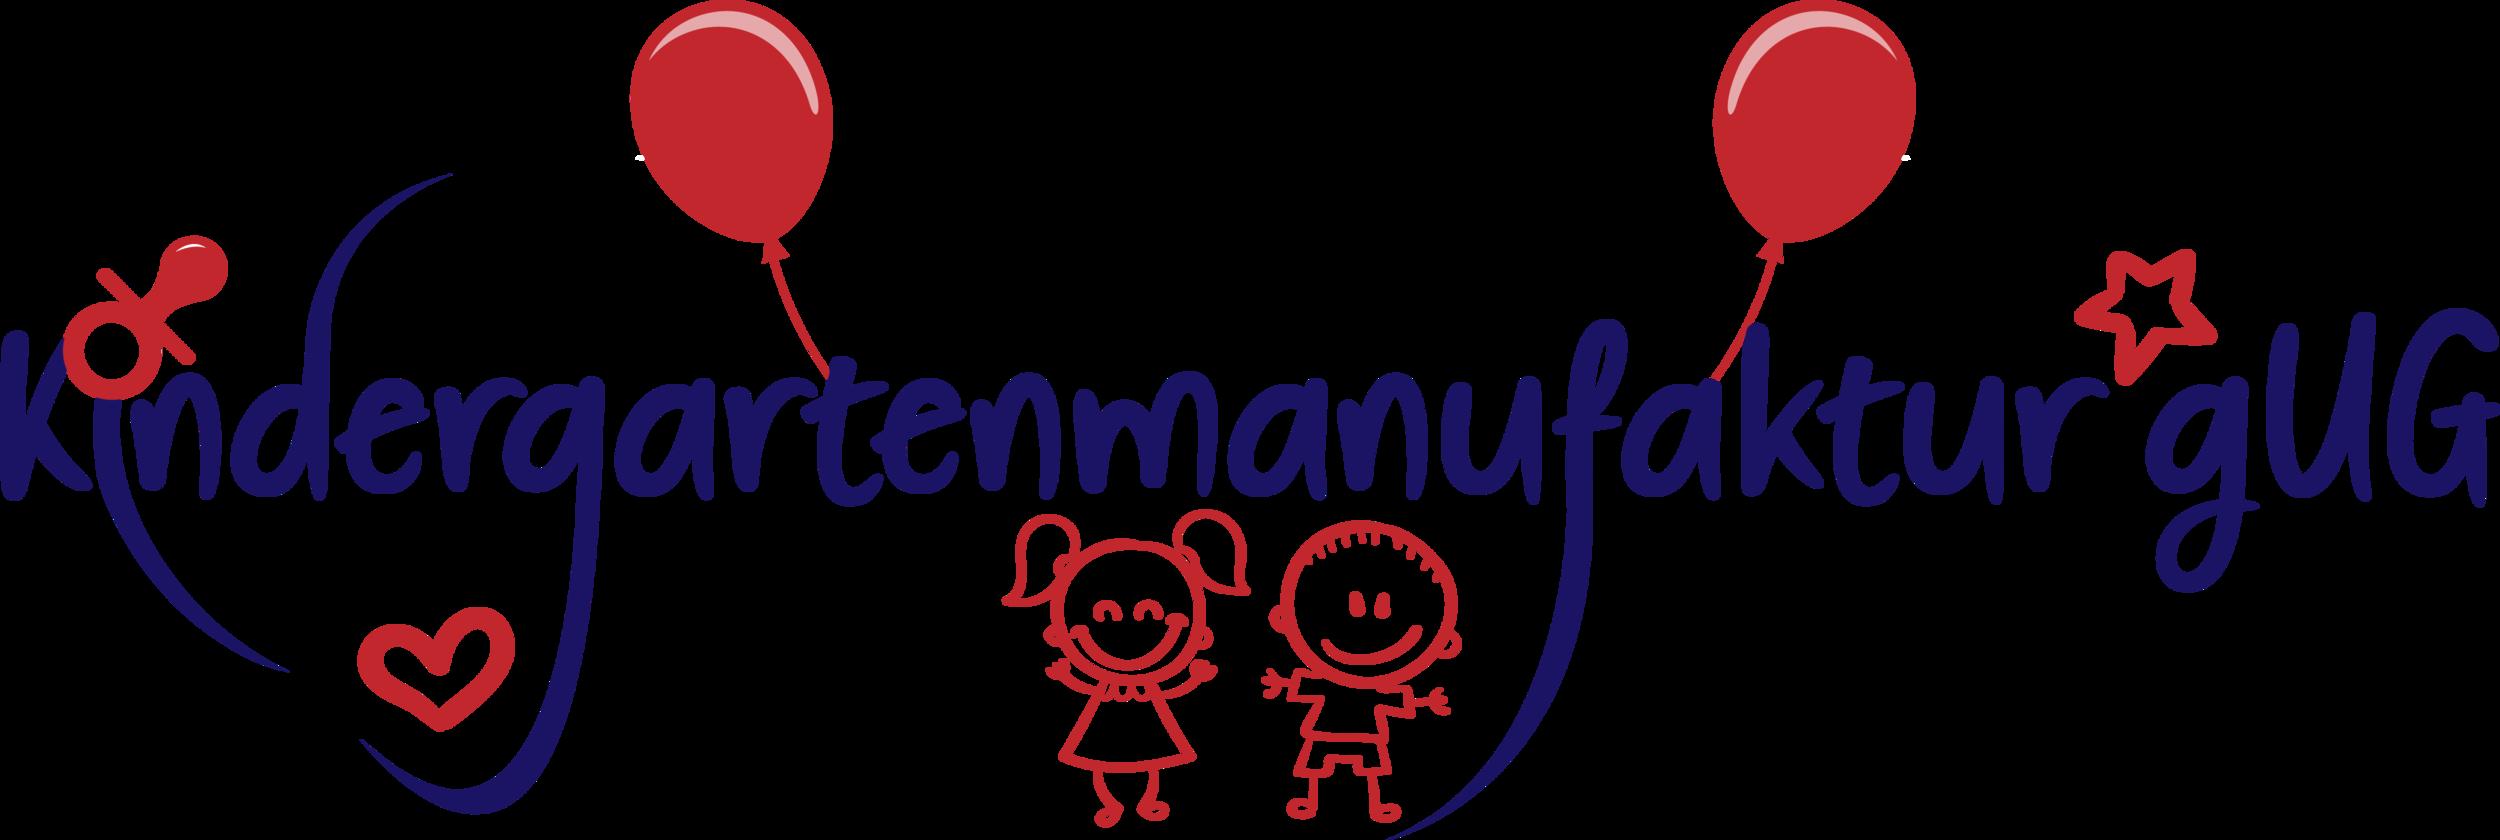 Kindergartenmanufaktur gUG